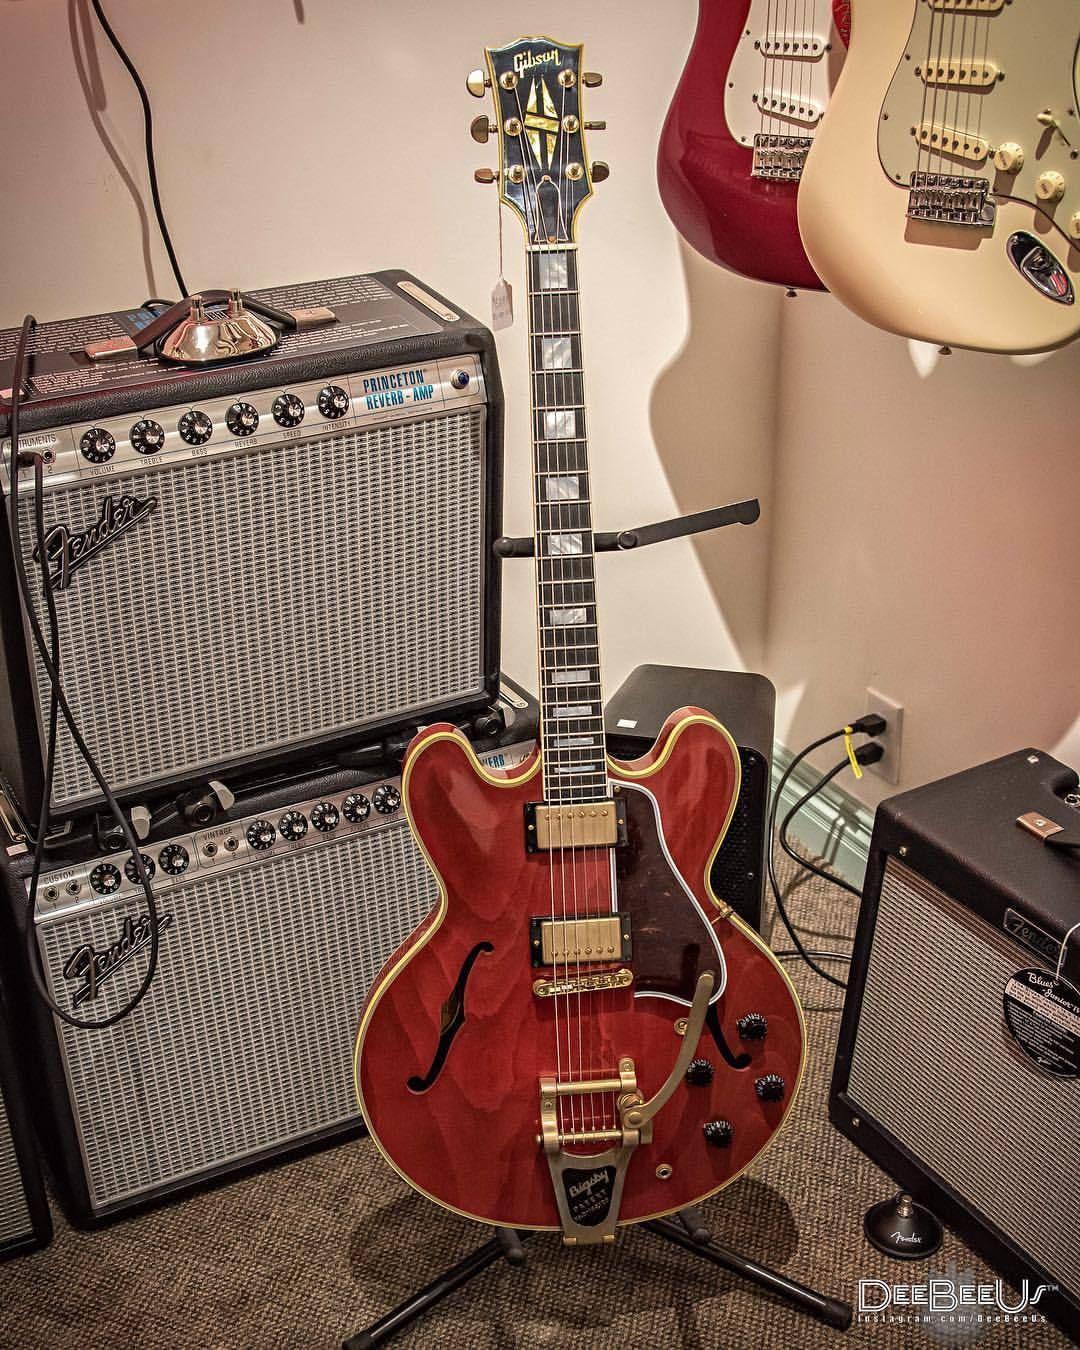 A Lovely Cherry Red Gibson Memphis Es355 Vos Spotted At 12fretguitar Toronto Wednesday Guitars Guitarra Chitarra Vintage Guitar Art Guitar Cool Guitar